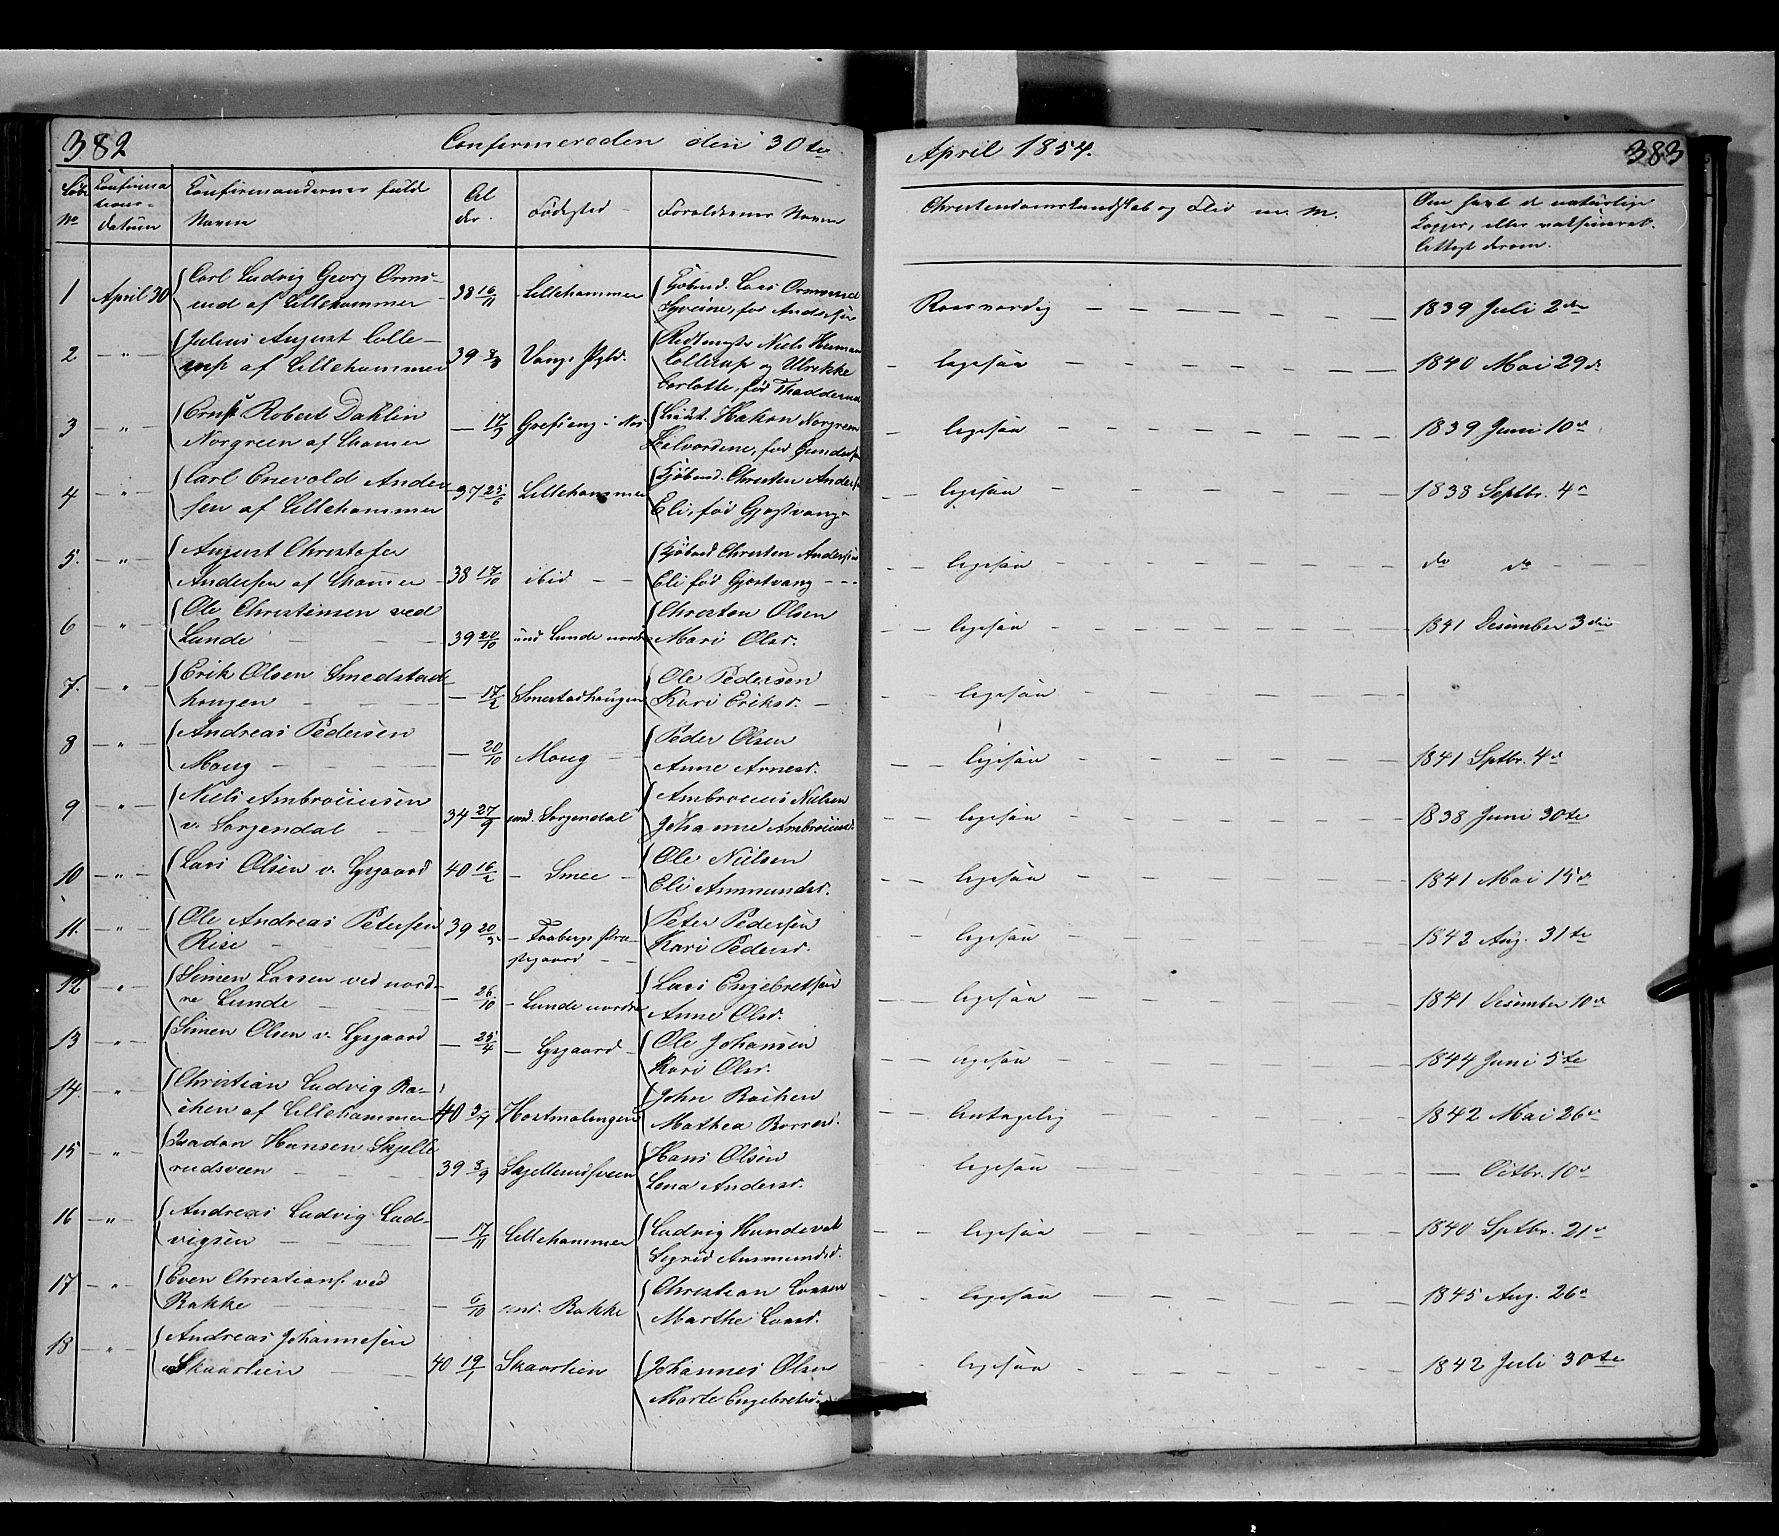 SAH, Fåberg prestekontor, Klokkerbok nr. 6, 1837-1855, s. 382-383